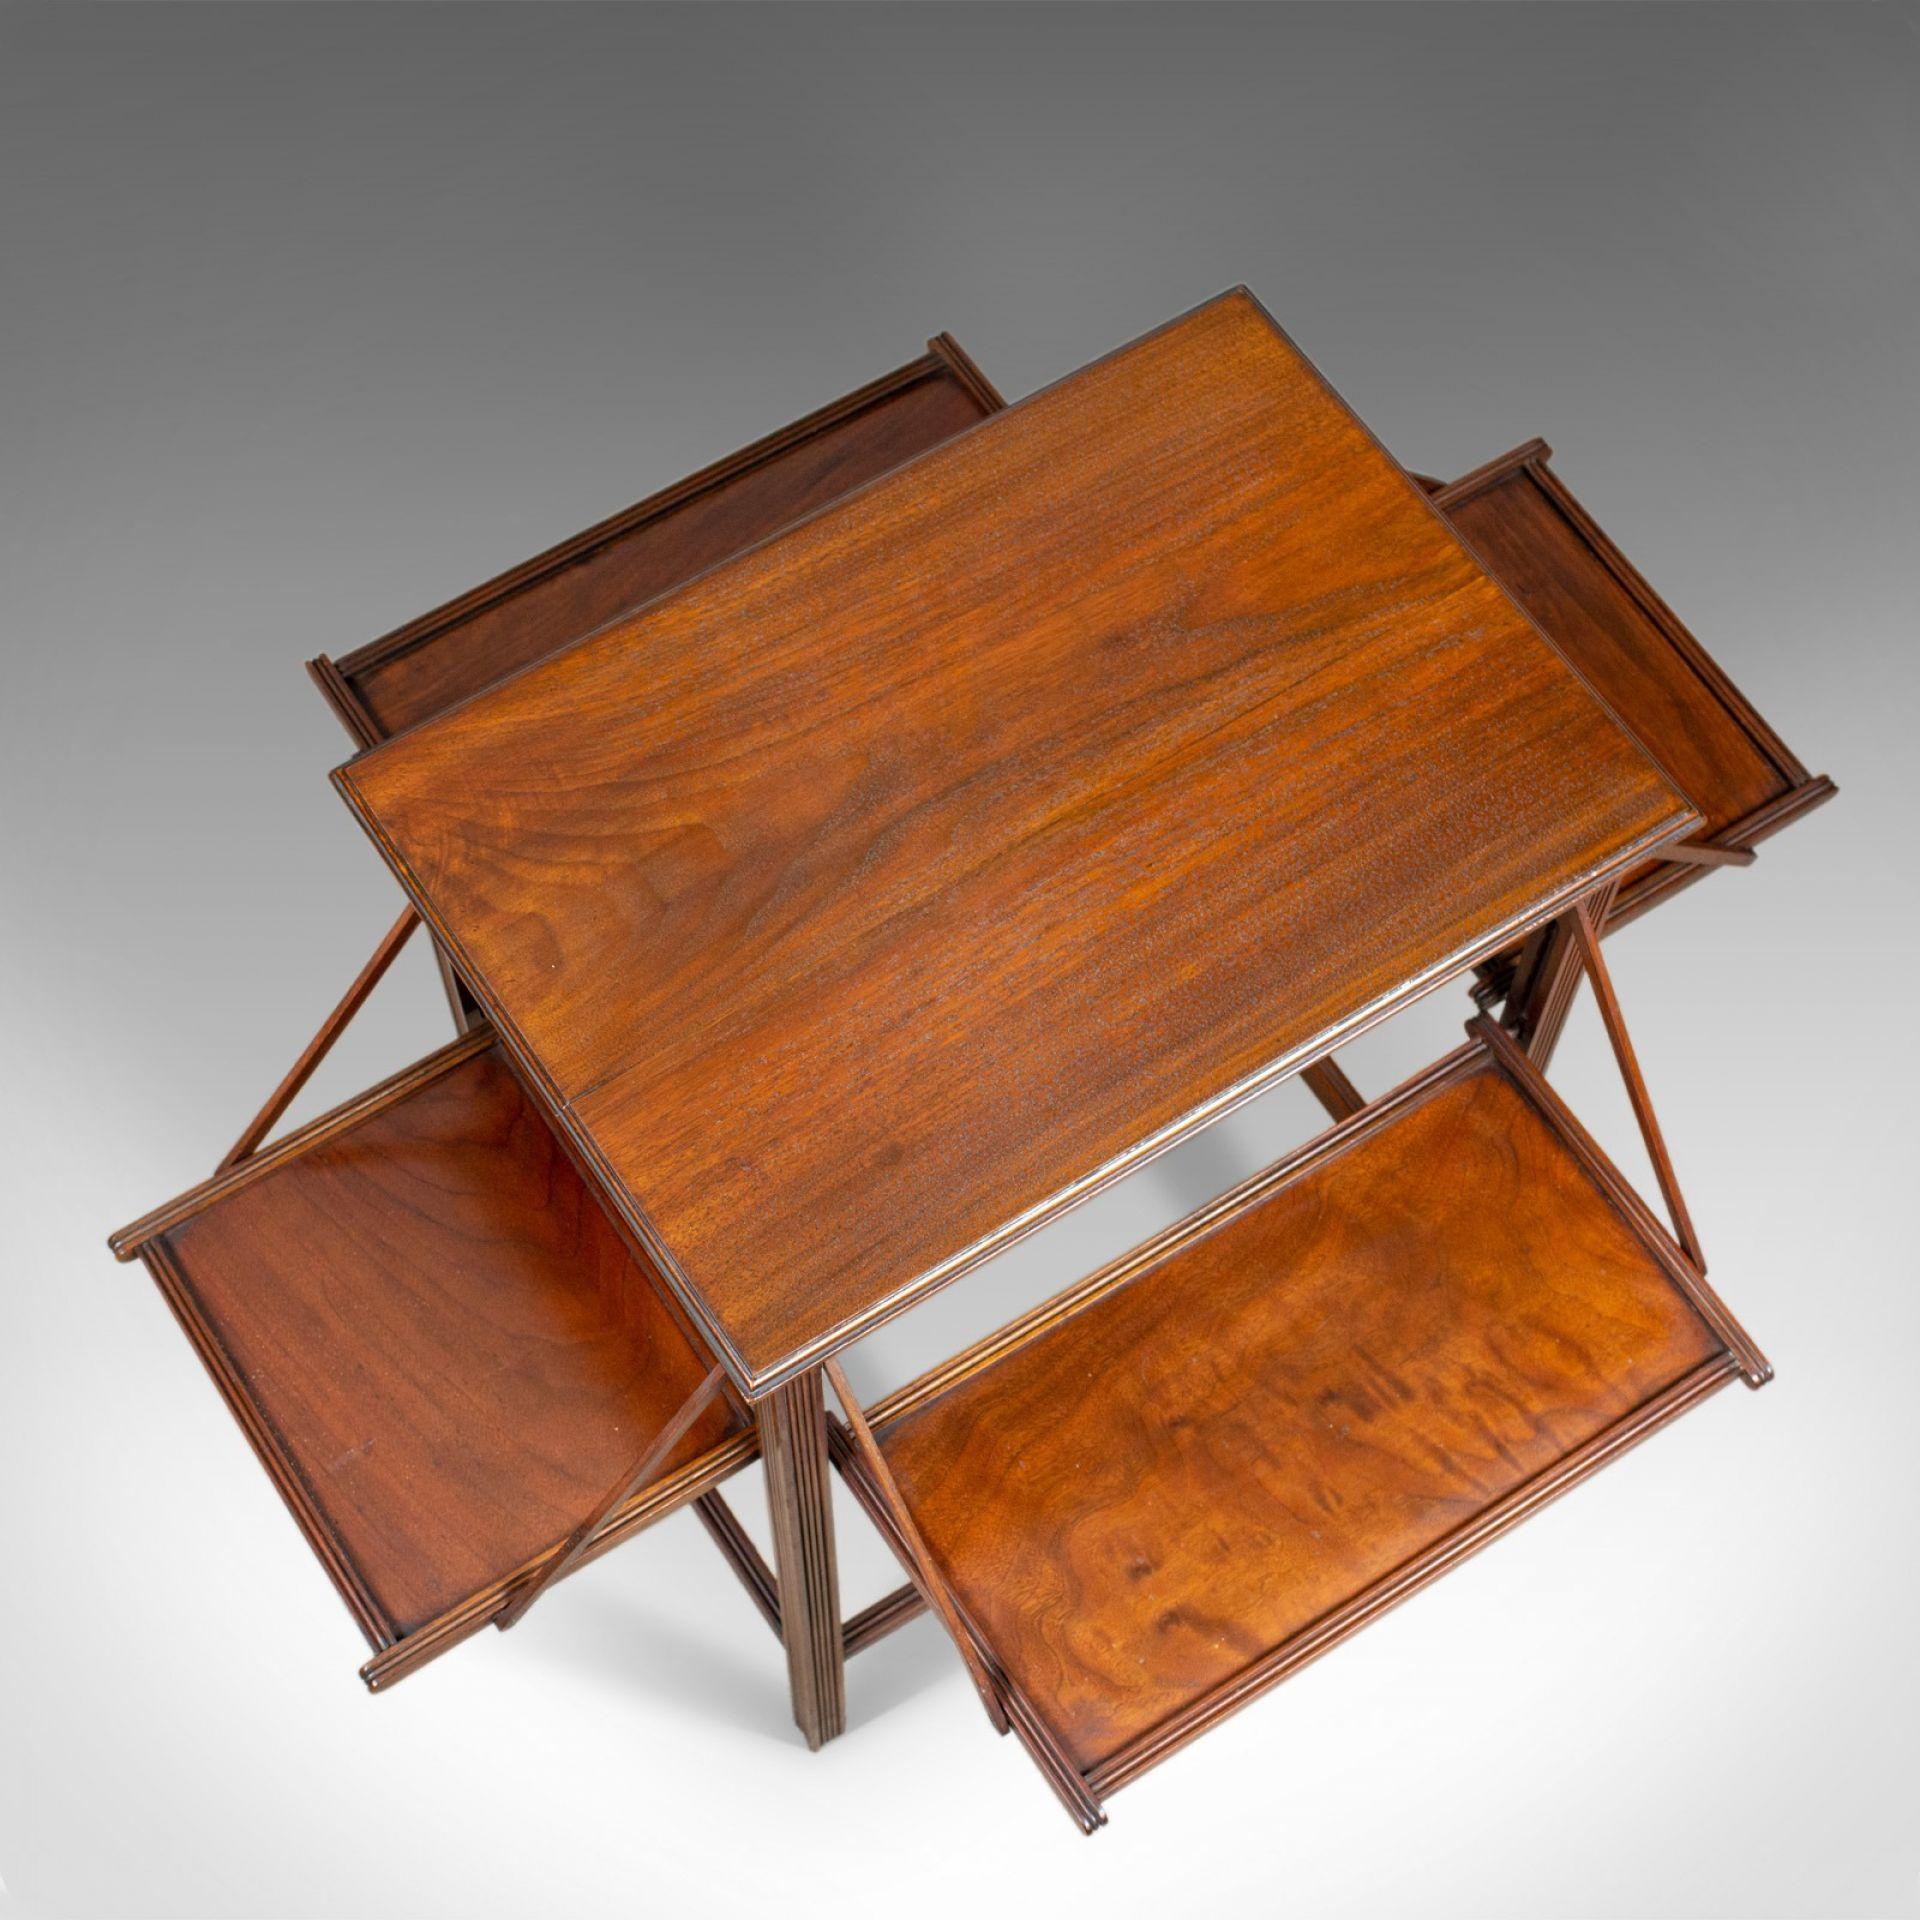 Antique Tea Table, English, Edwardian, Walnut, Cake Stand, Folding, Circa 1910